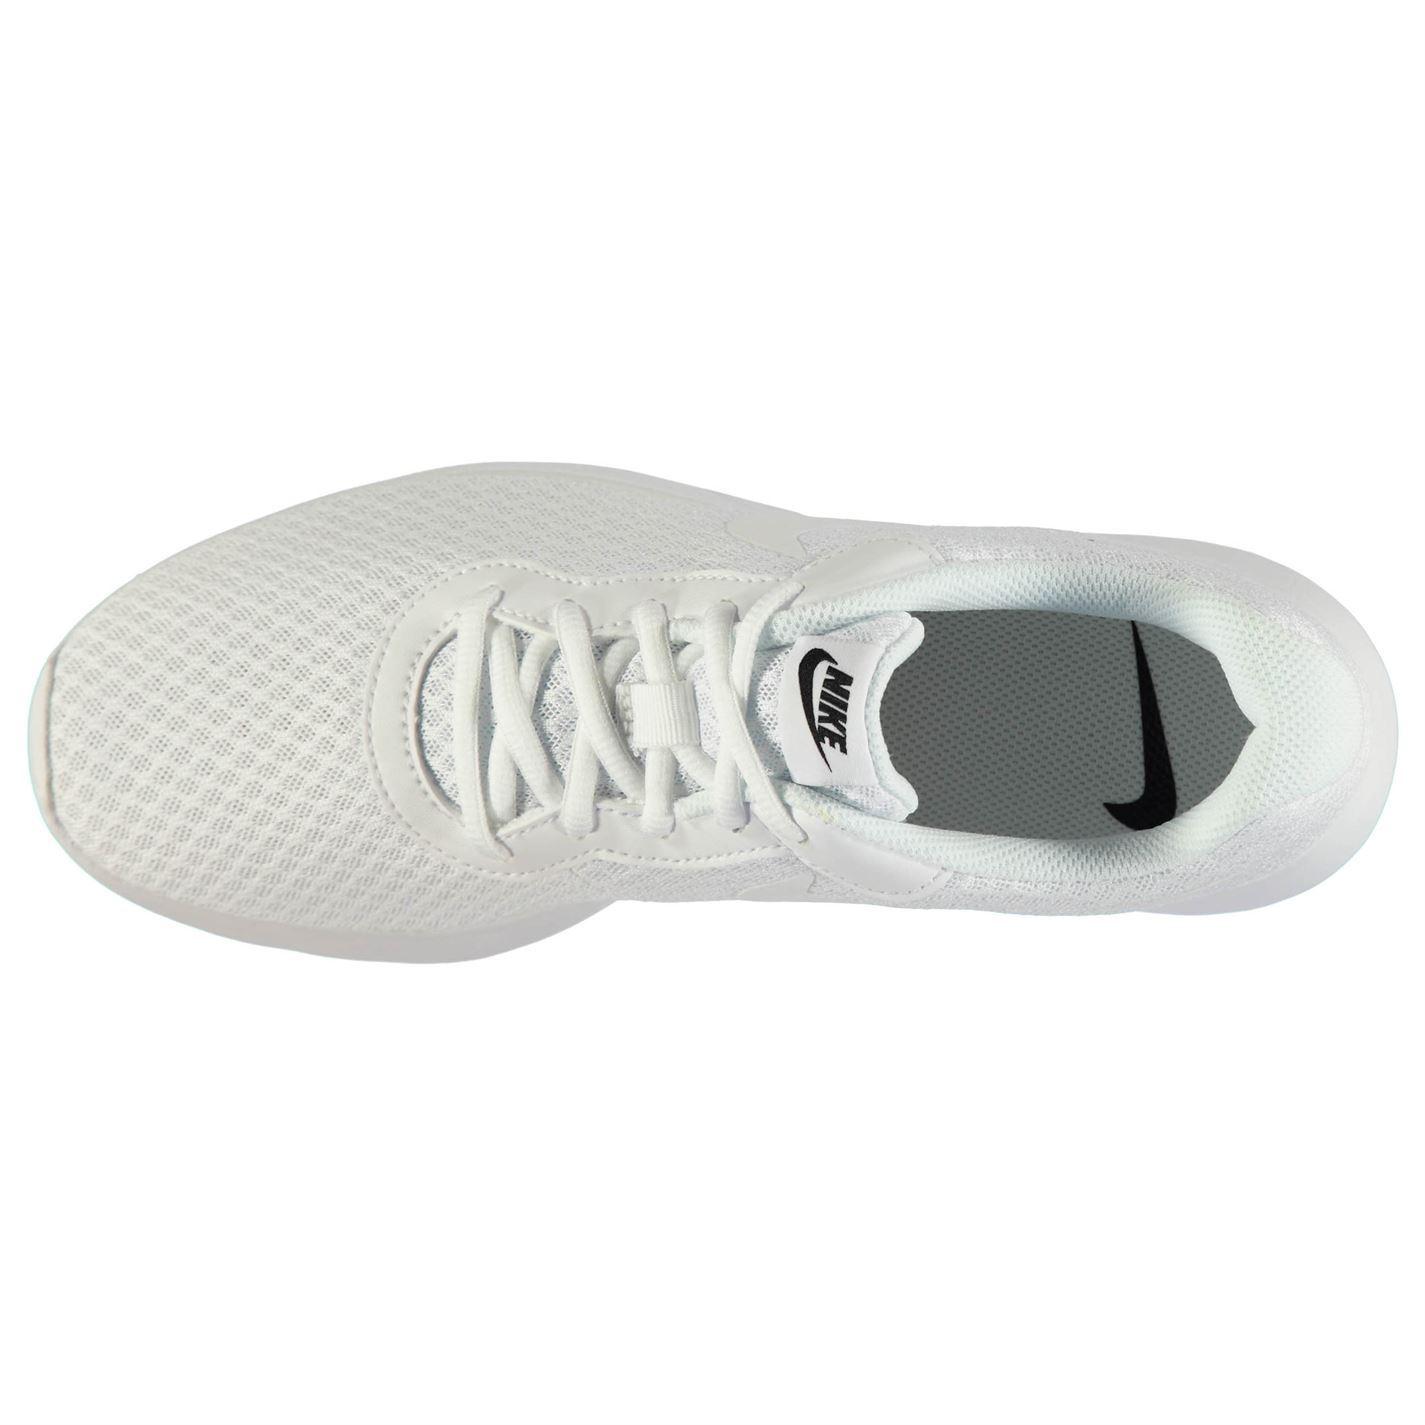 cheap for discount 28ed4 56010 ... Mens scarpe Nike Tanjun formazione di bianco bianco sport e Fitness  Trainer Sneakers